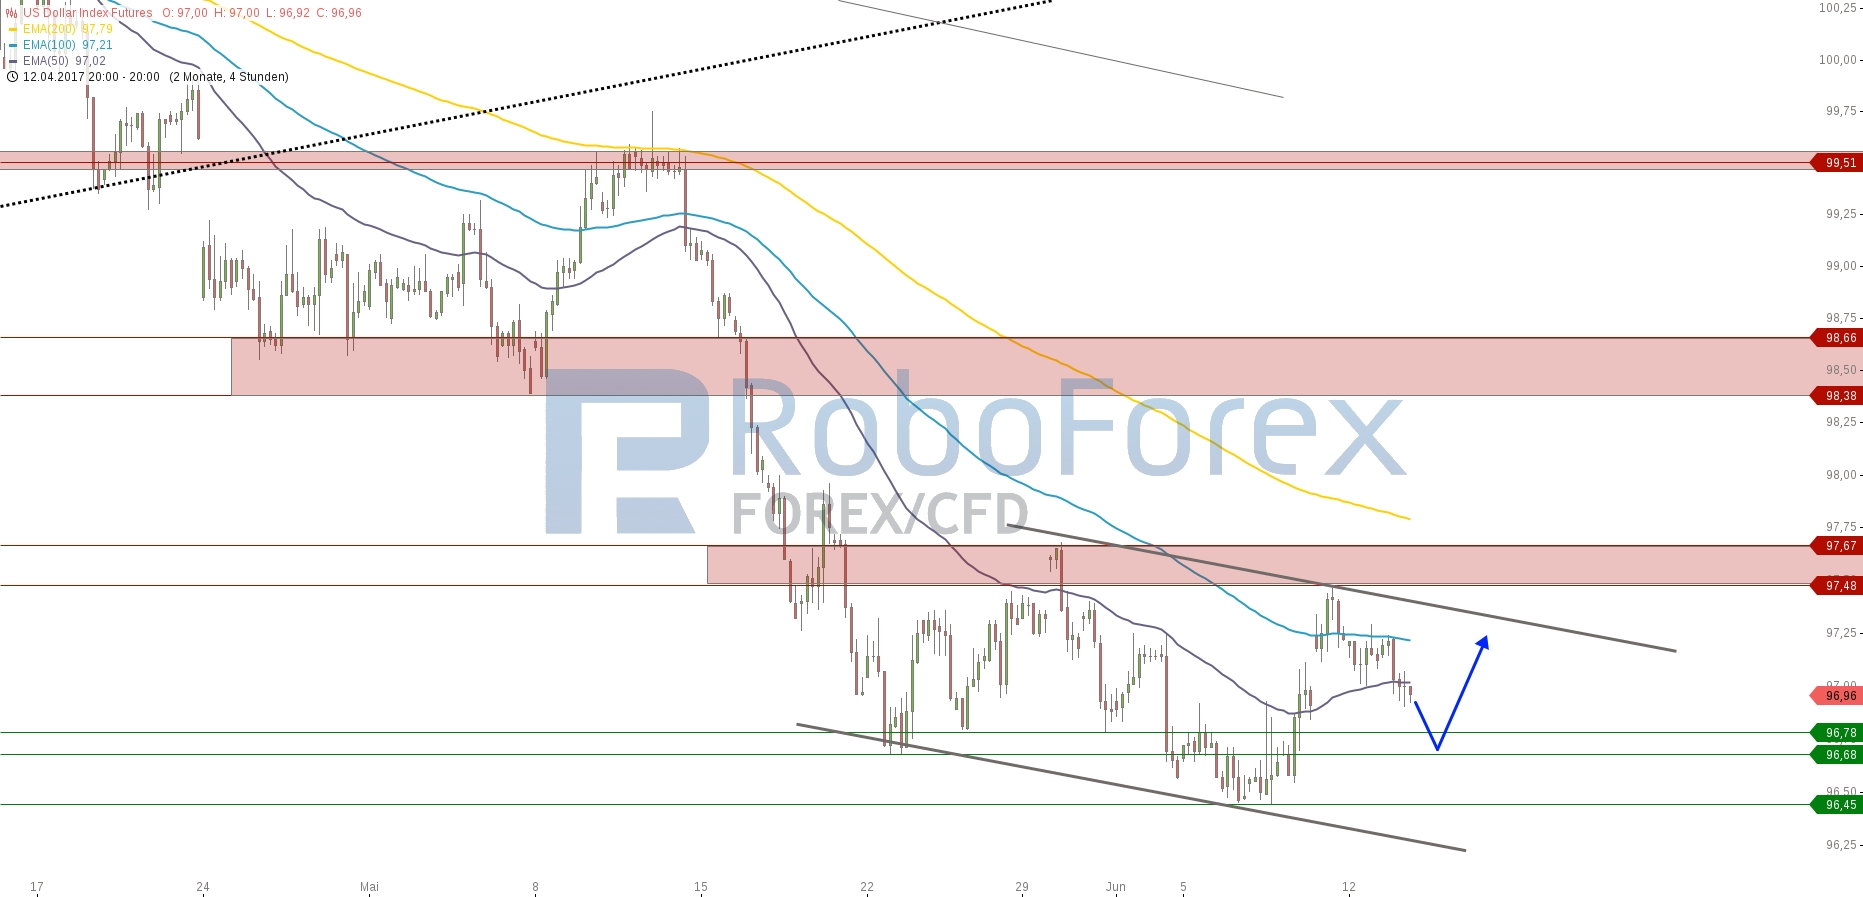 chart-13062017-2122-usdollarindexfutures-roboforex.jpg